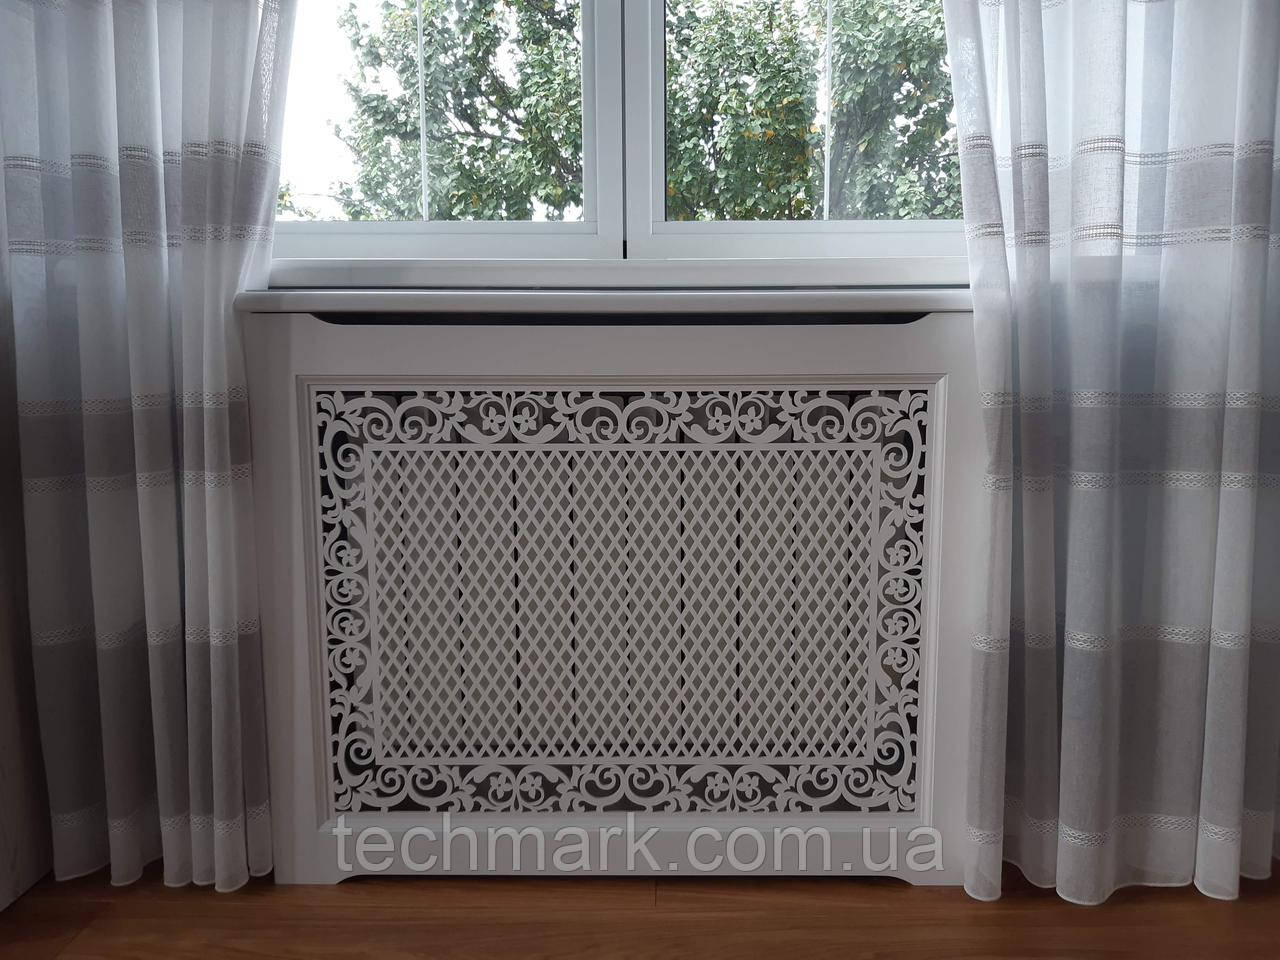 Декоративная решетка экран (короб) на батарею отопления R55-K60